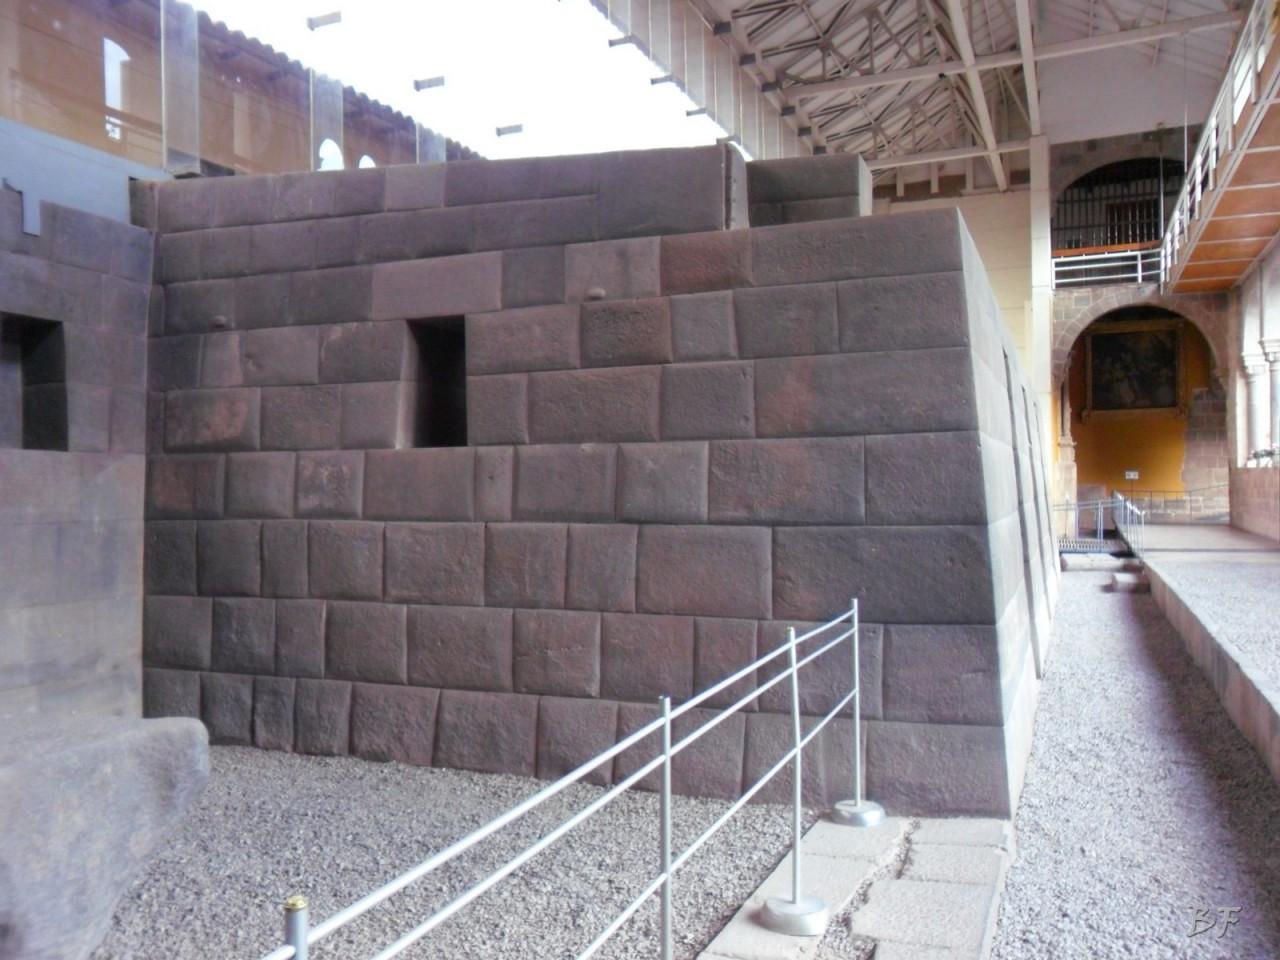 Mura-Poligonali-Megaliti-Tempio-Coricancha-Cusco-Perù-23